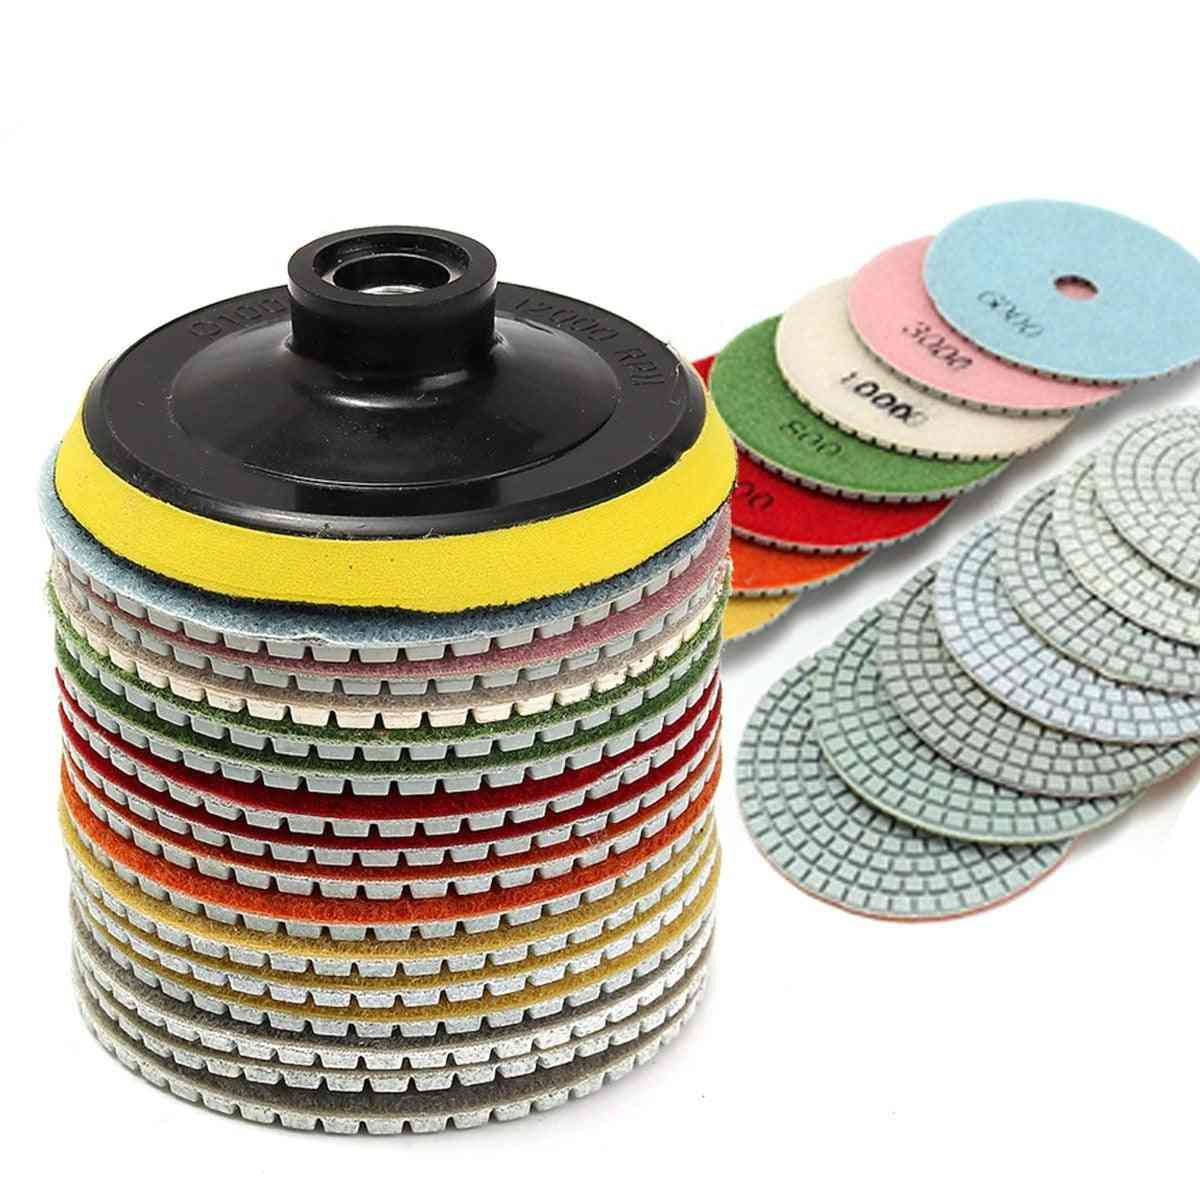 Diamond Polishing Pads Kit For Granite/concrete/marble Stone And Tiles